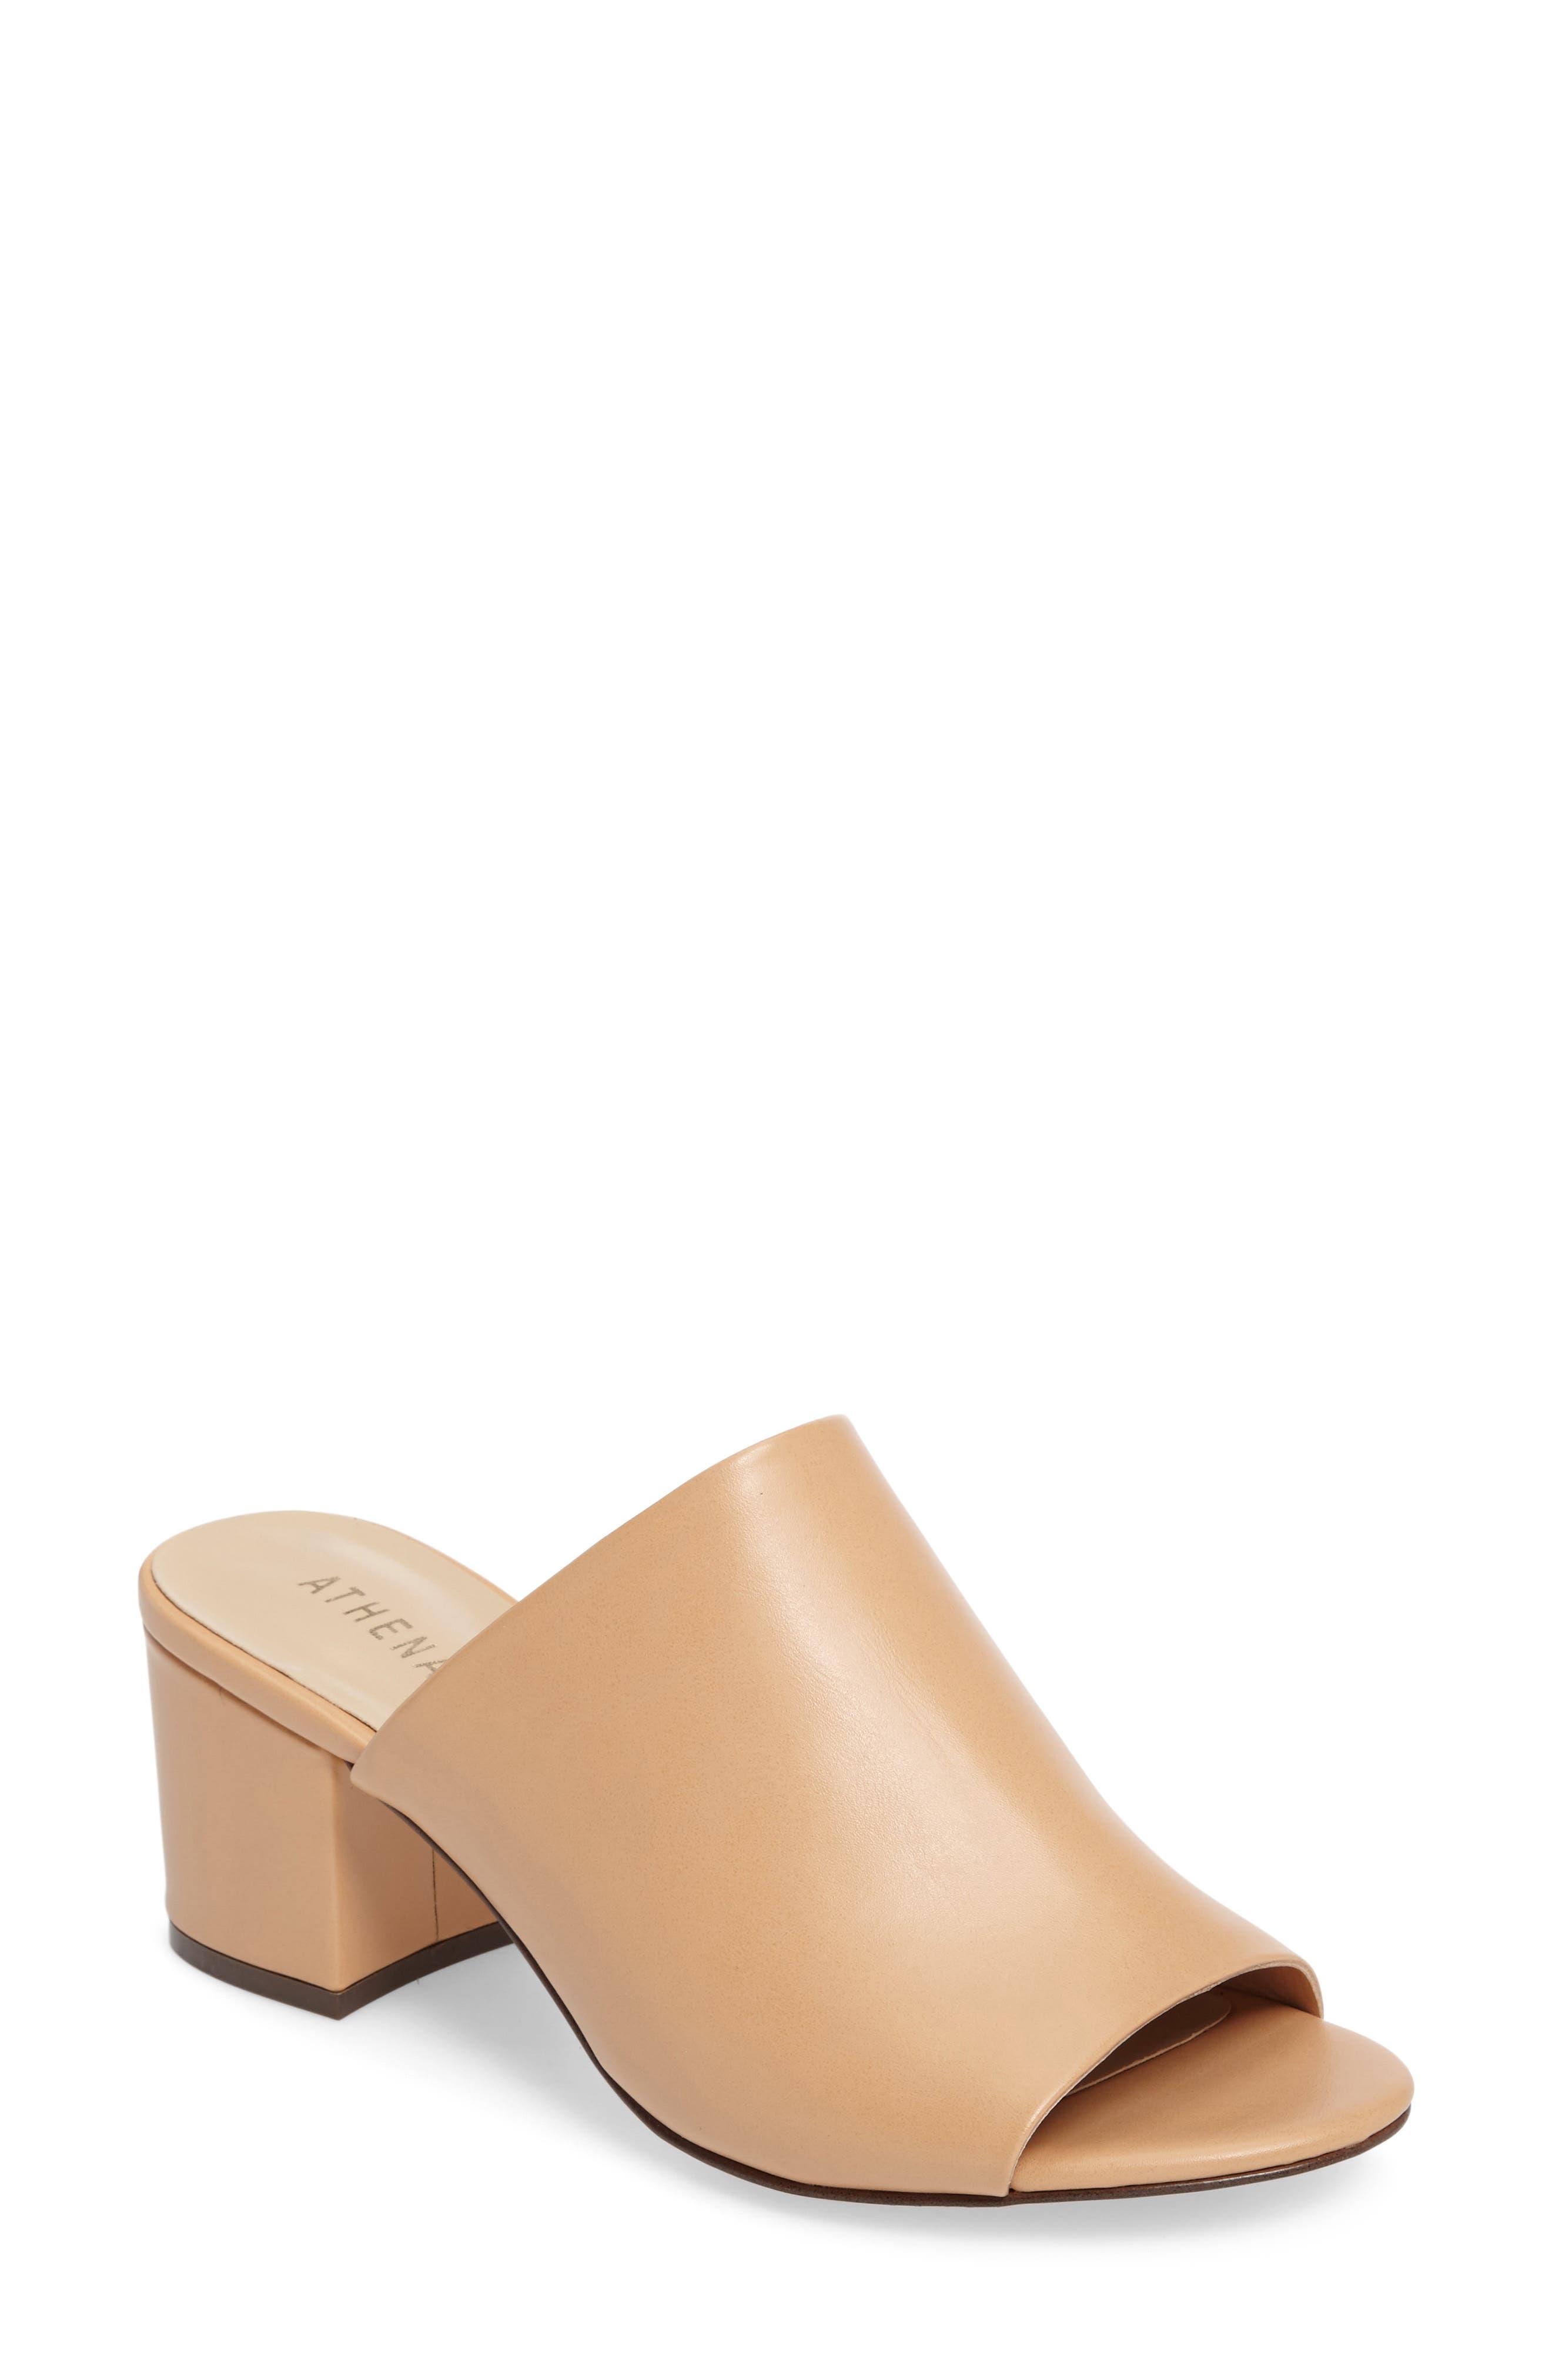 Robyne Slide Sandal,                         Main,                         color, Nude Faux Suede